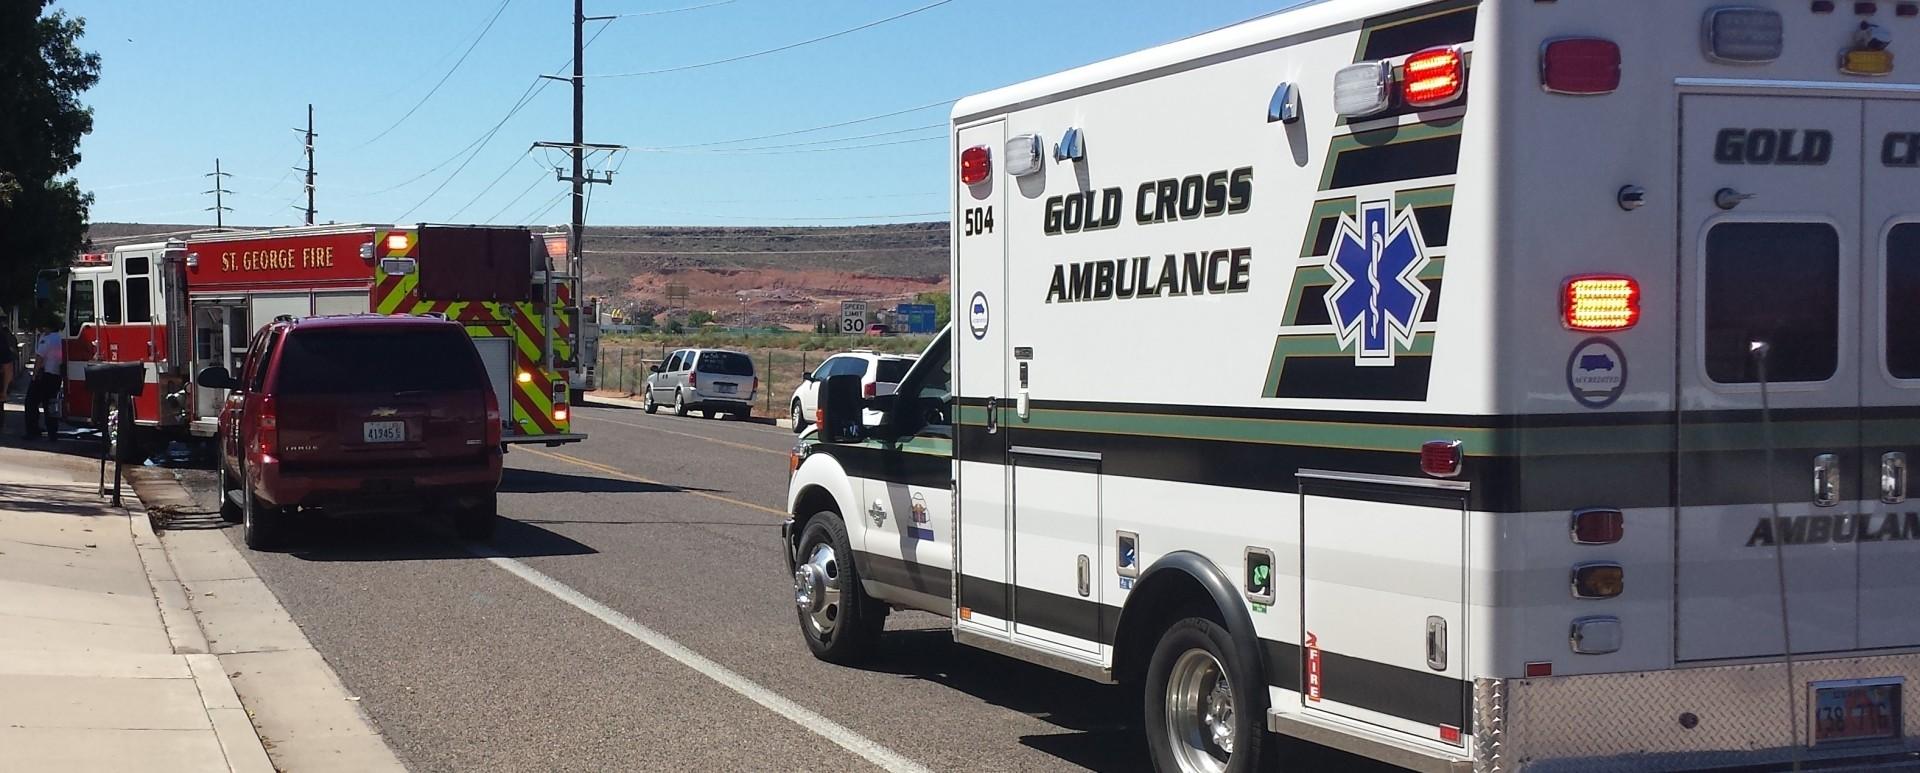 Structure fire at SUU Head Start Preschool. St. George, Utah September 22, 2014 | Photo by T.S Romney St. George News